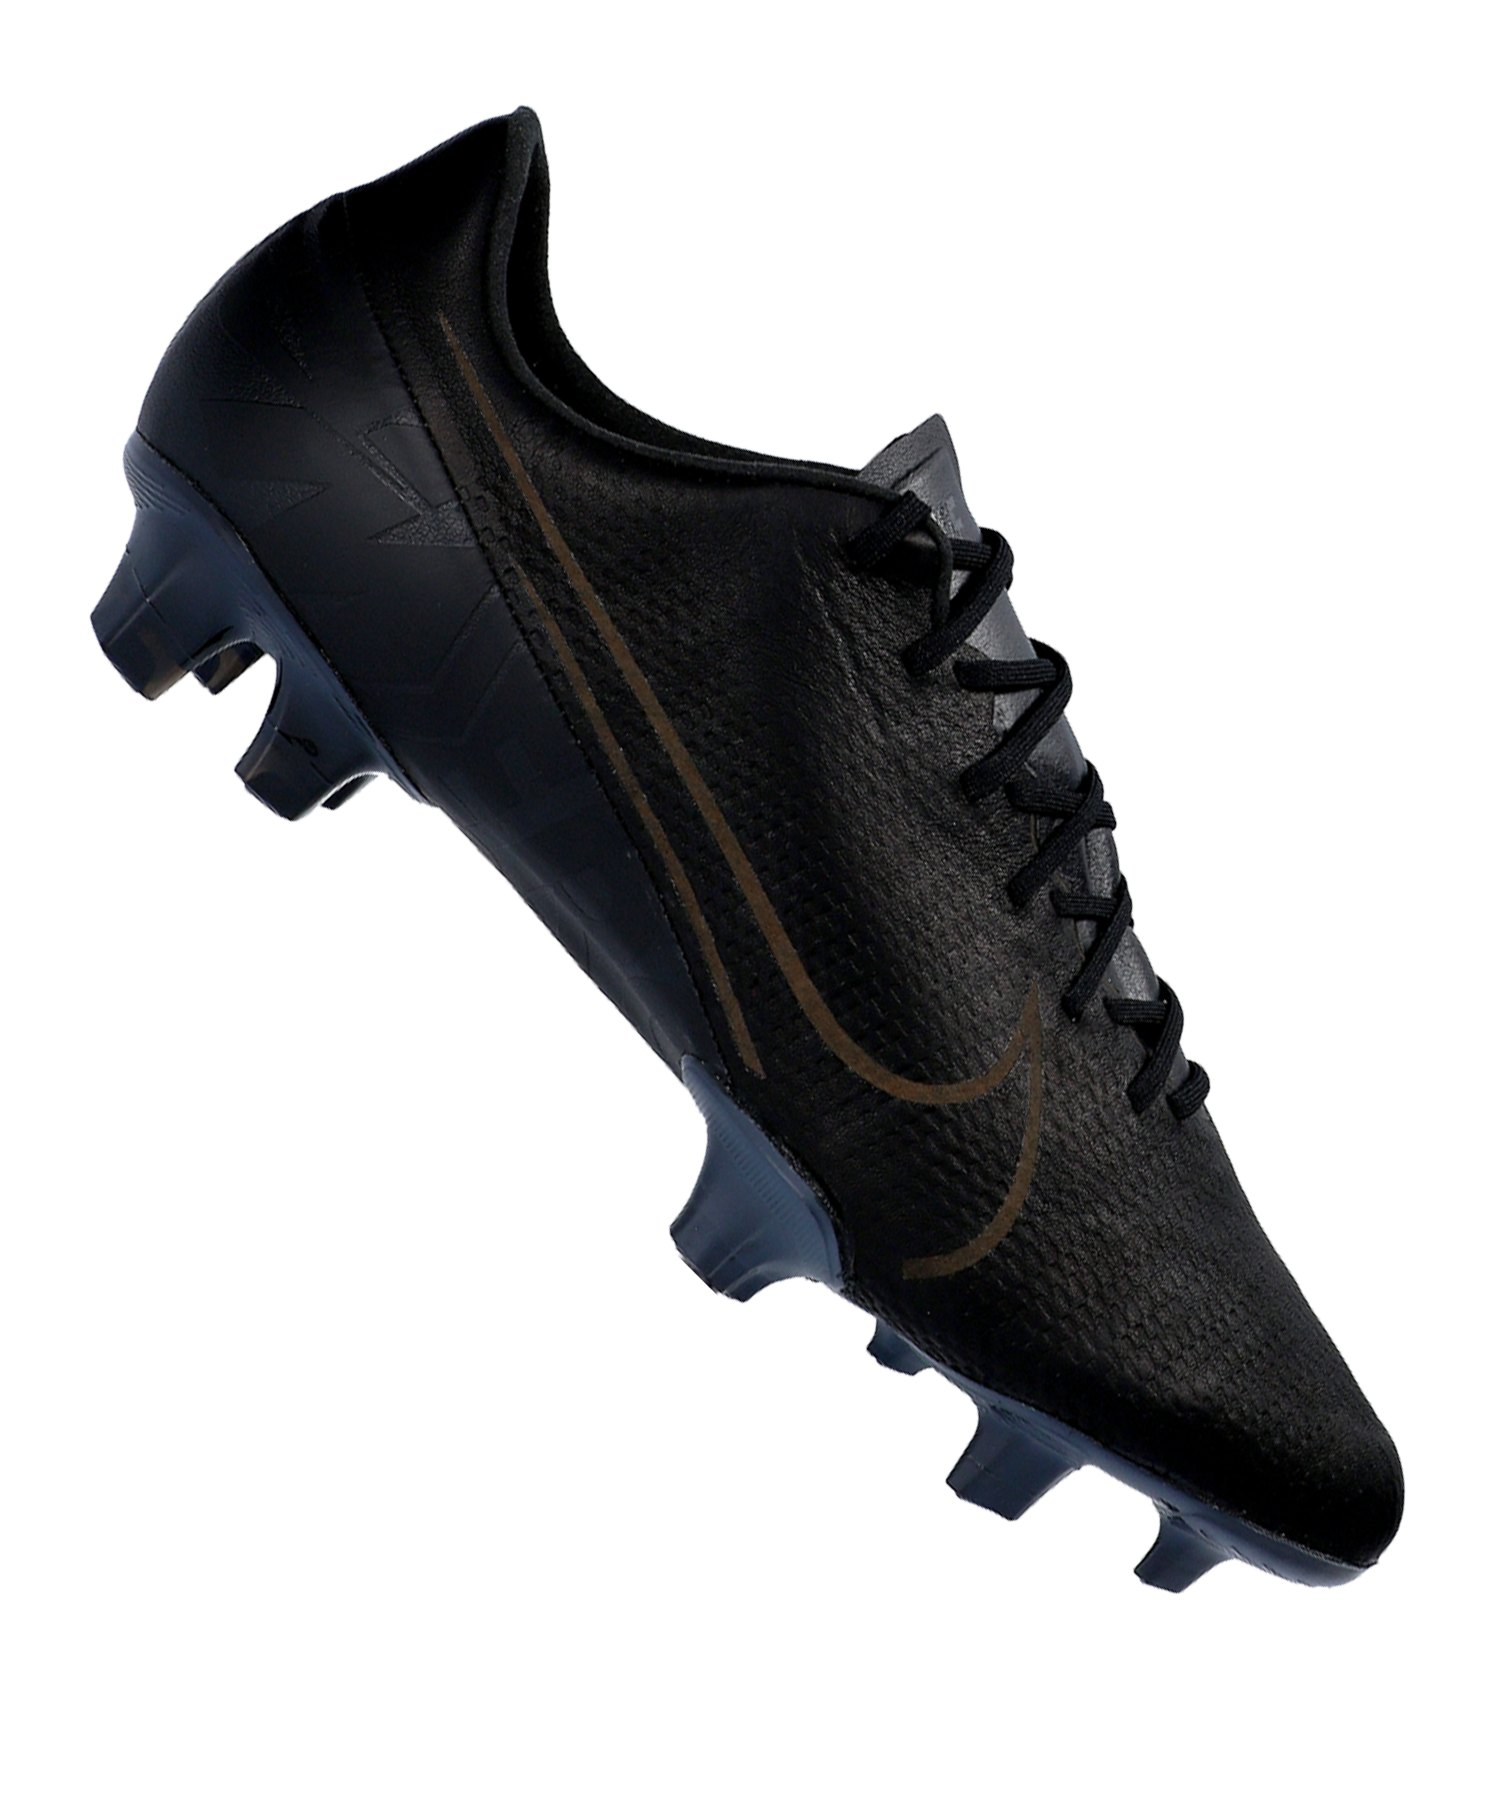 nike fußballschuhe mercurial veloce fg, Nike Air Pegasus